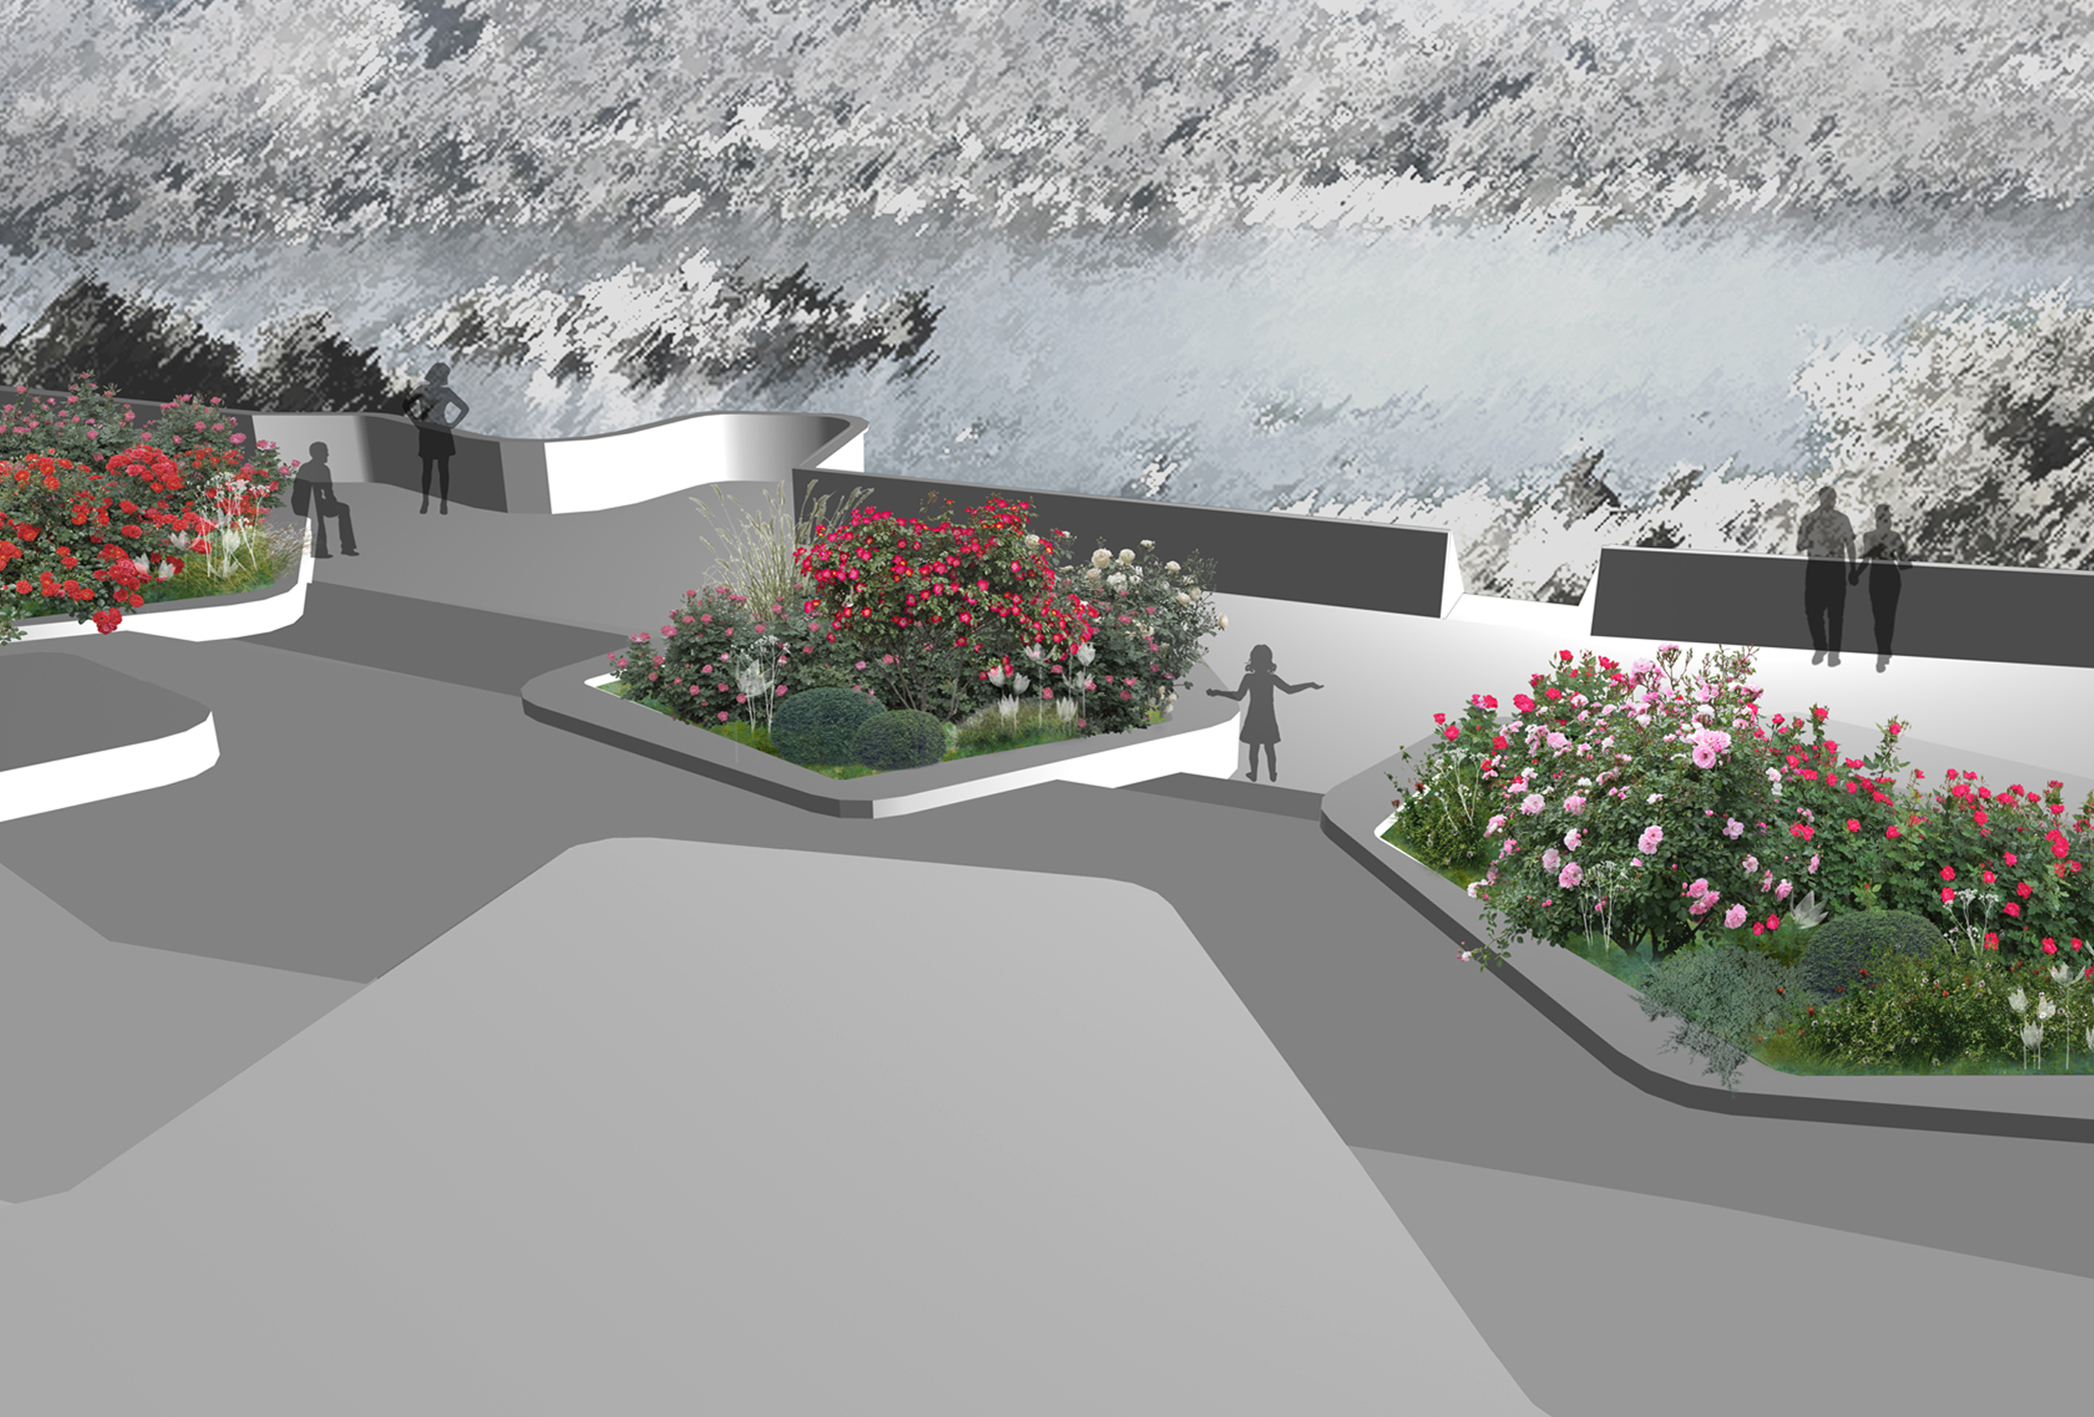 giardino-a-Orta-San-Giulio